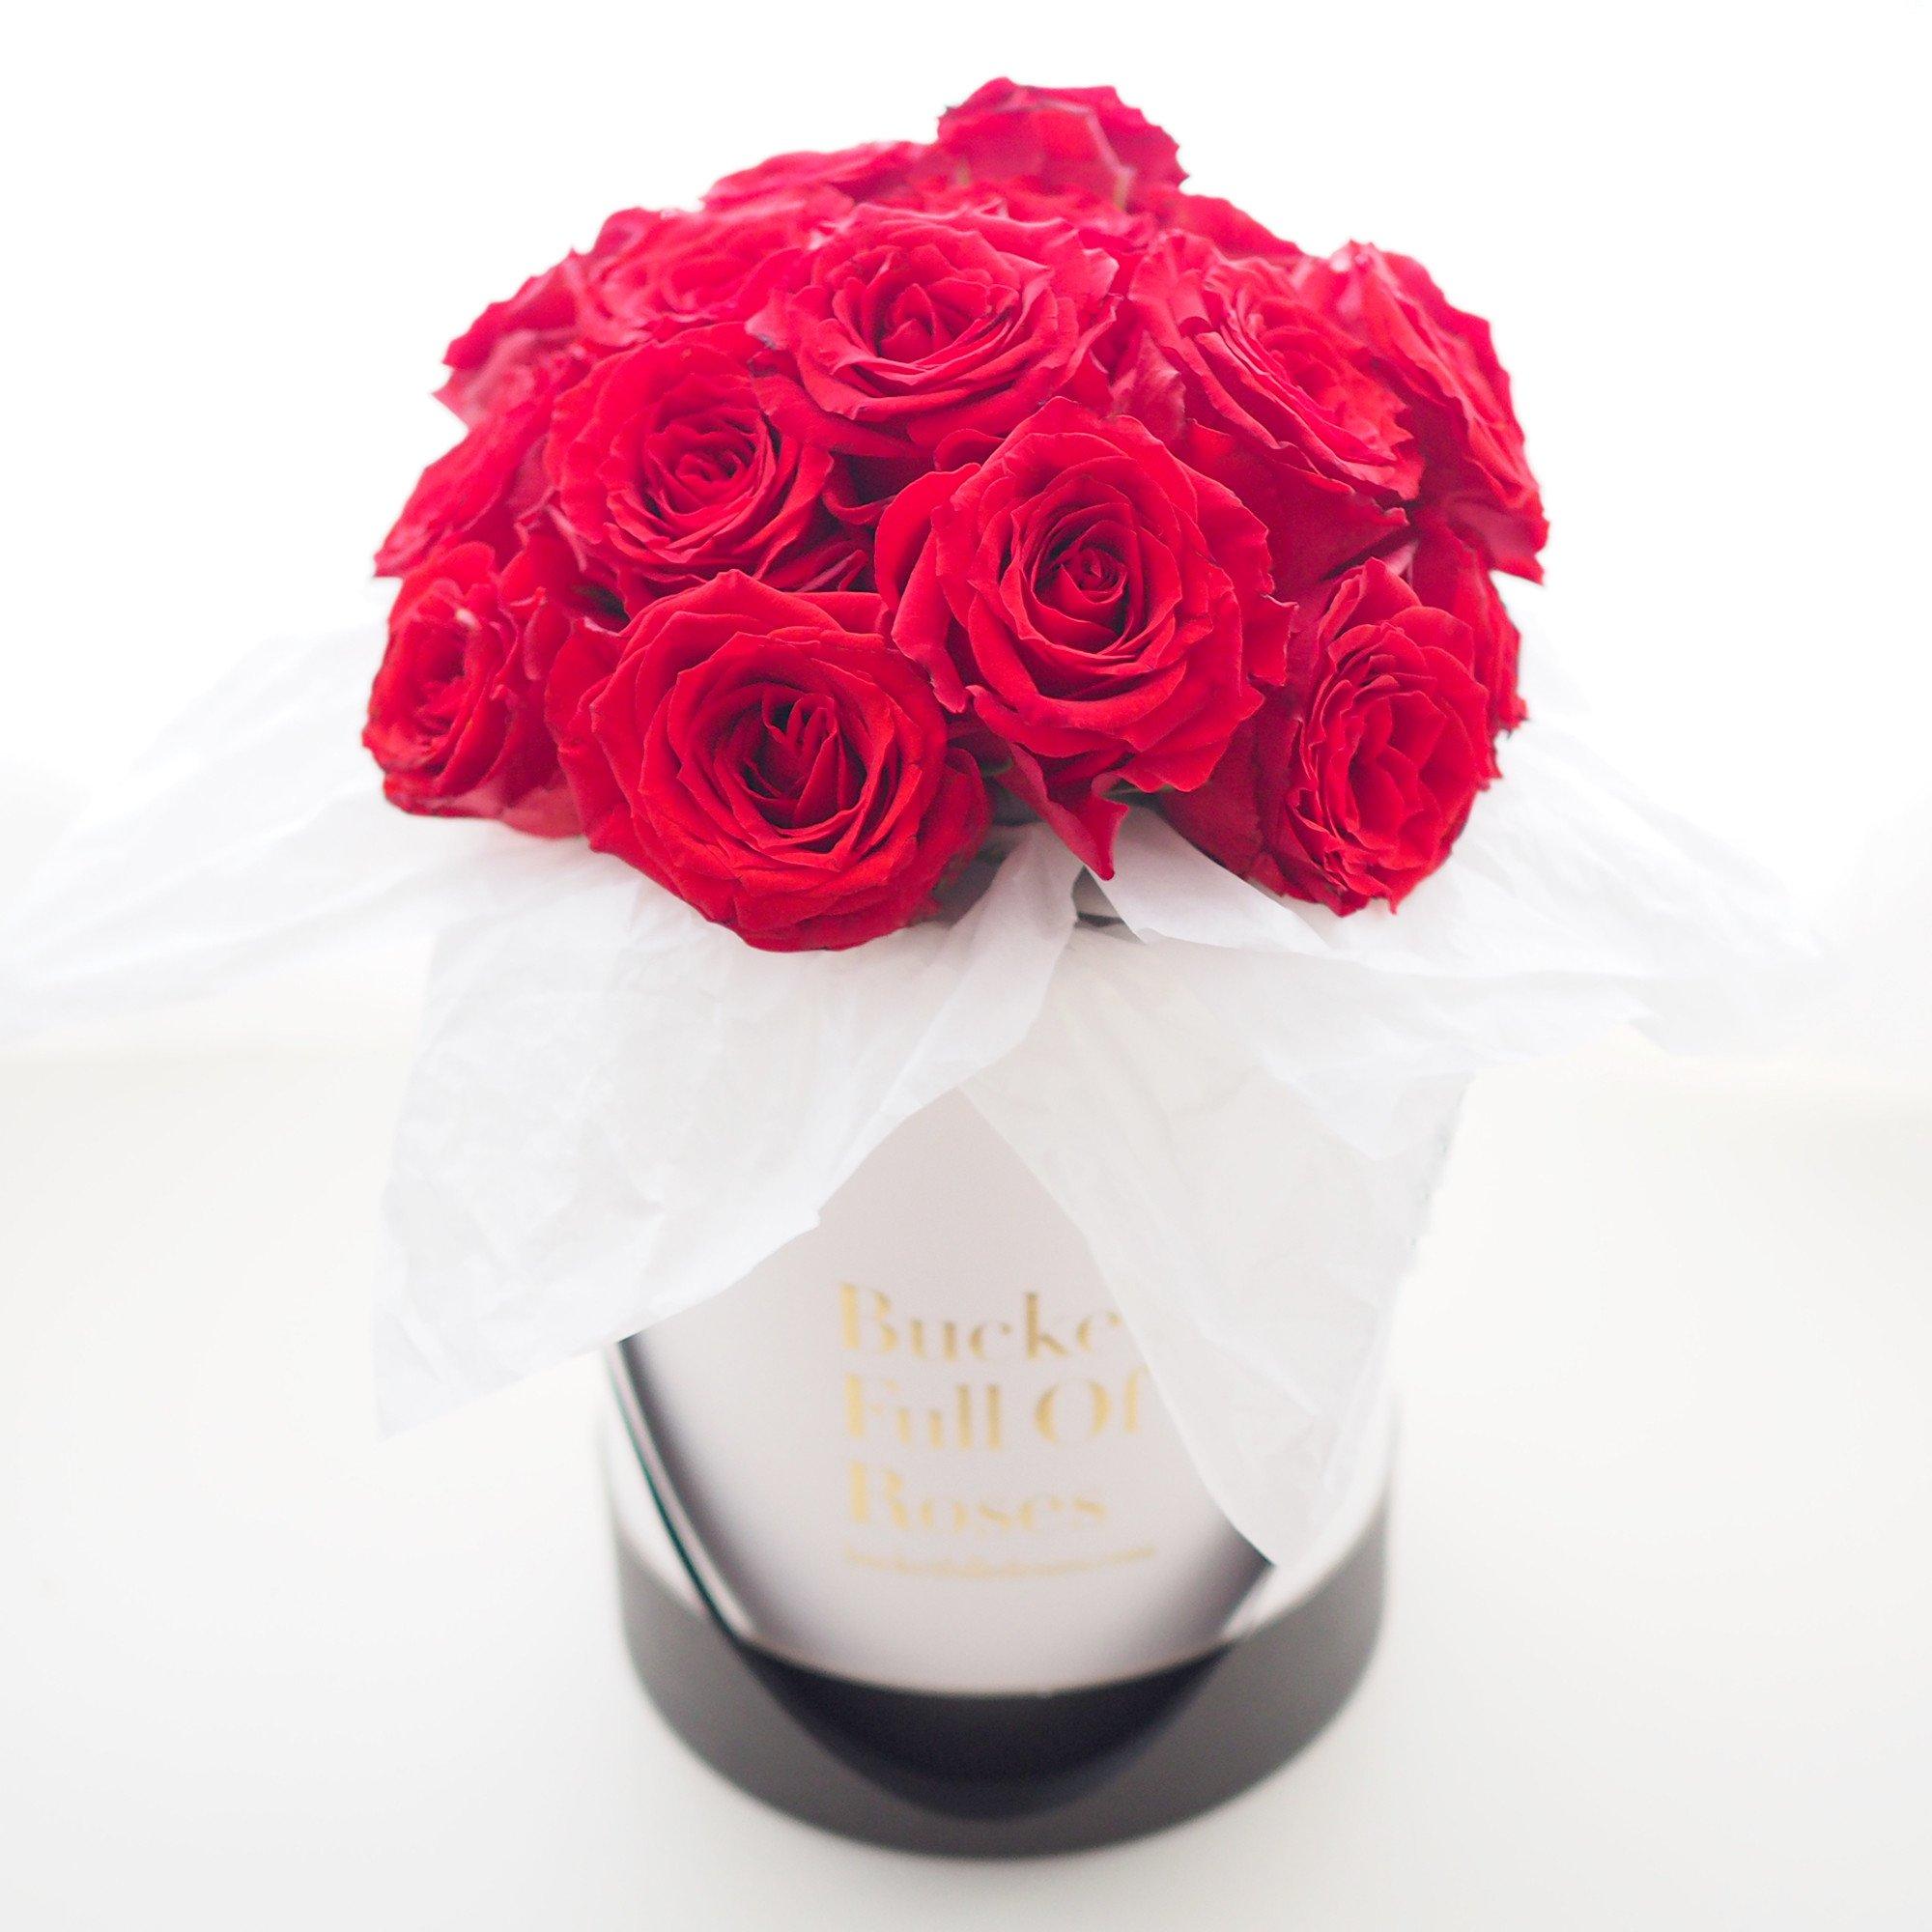 Rose bucket photo